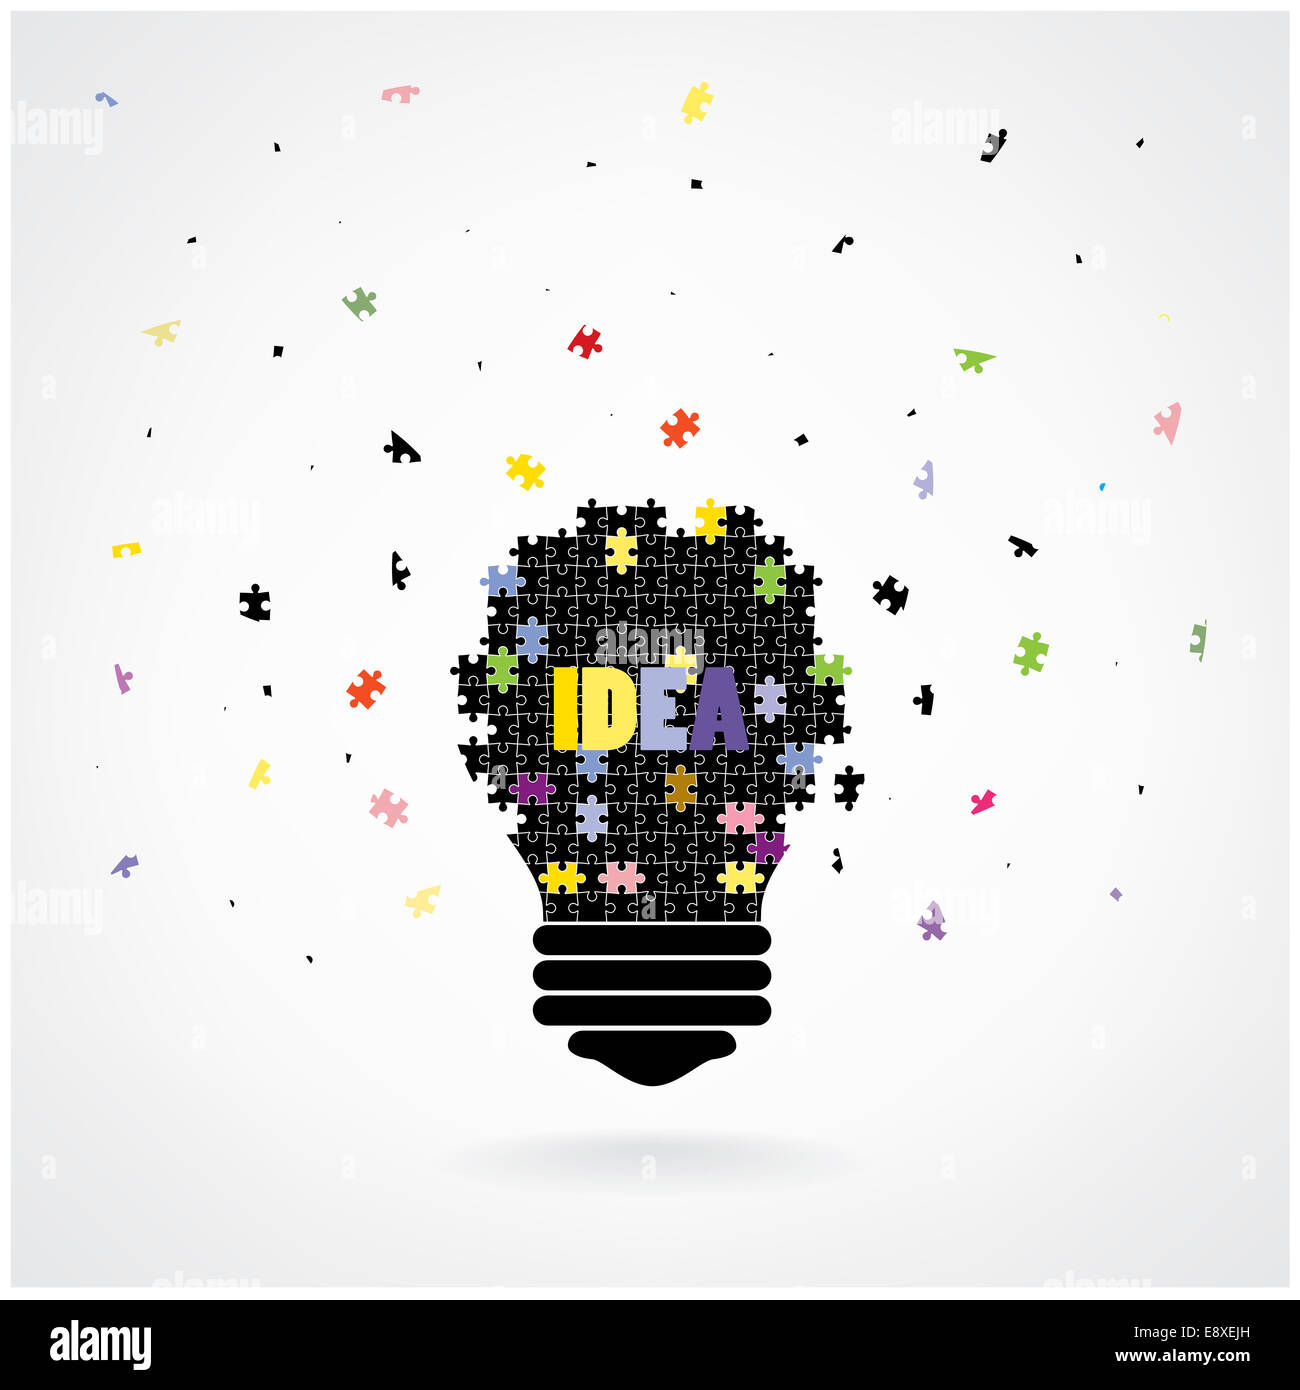 creative puzzle light bulb idea concept background design for poster flyer cover brochure education concept business idea